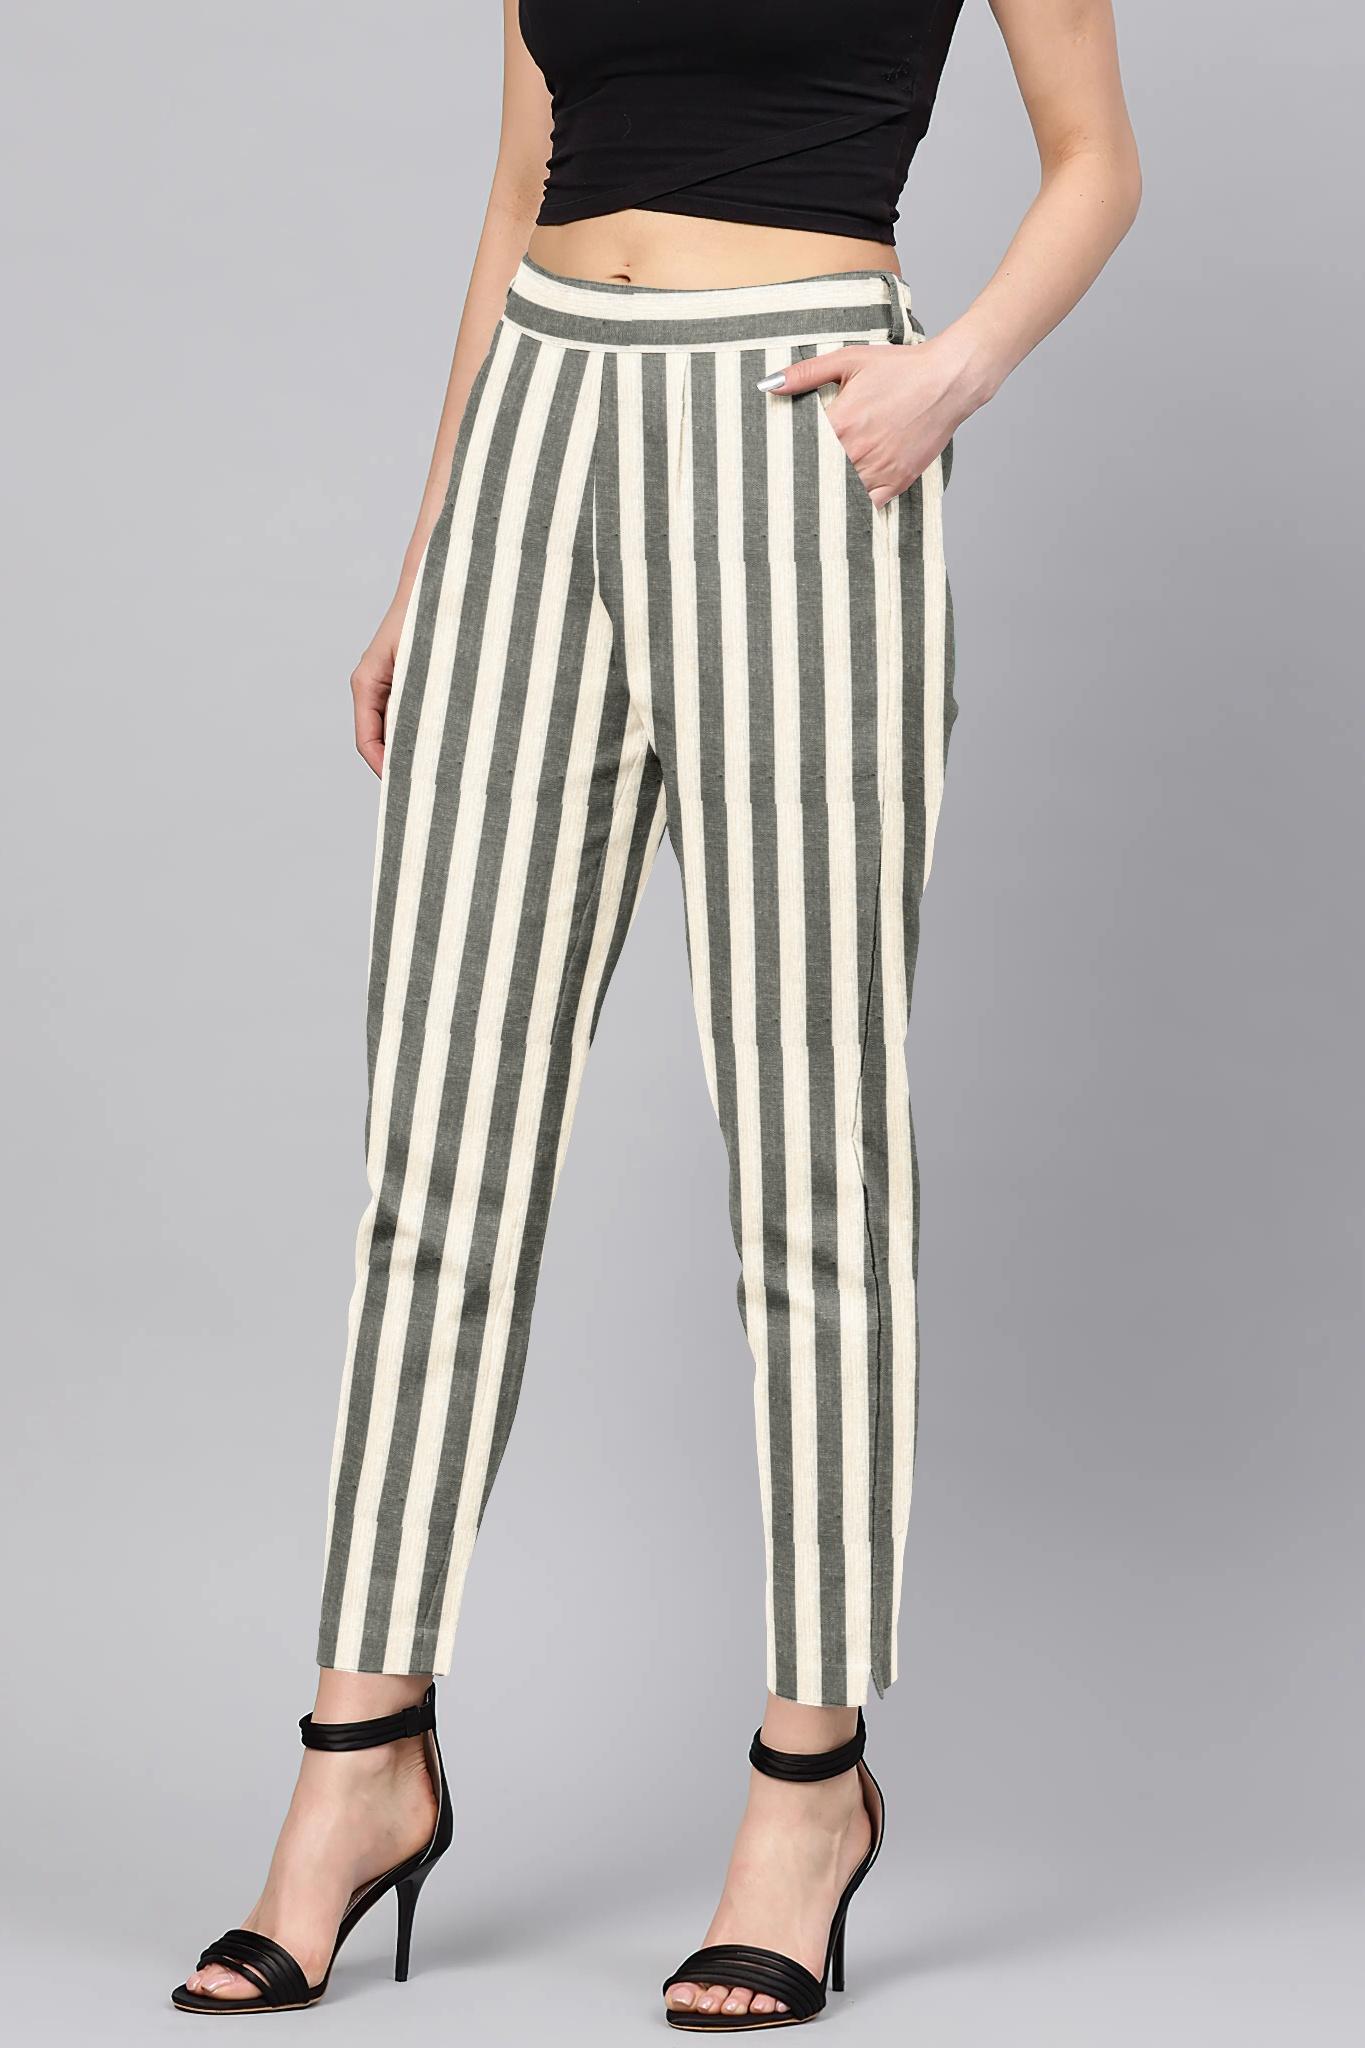 /home/customer/www/fabartcraft.com/public_html/uploadshttps://www.shopolics.com/uploads/images/medium/Gray-White-Cotton-Stripe-Regular-Fit-Solid-Trouser-36085.jpg